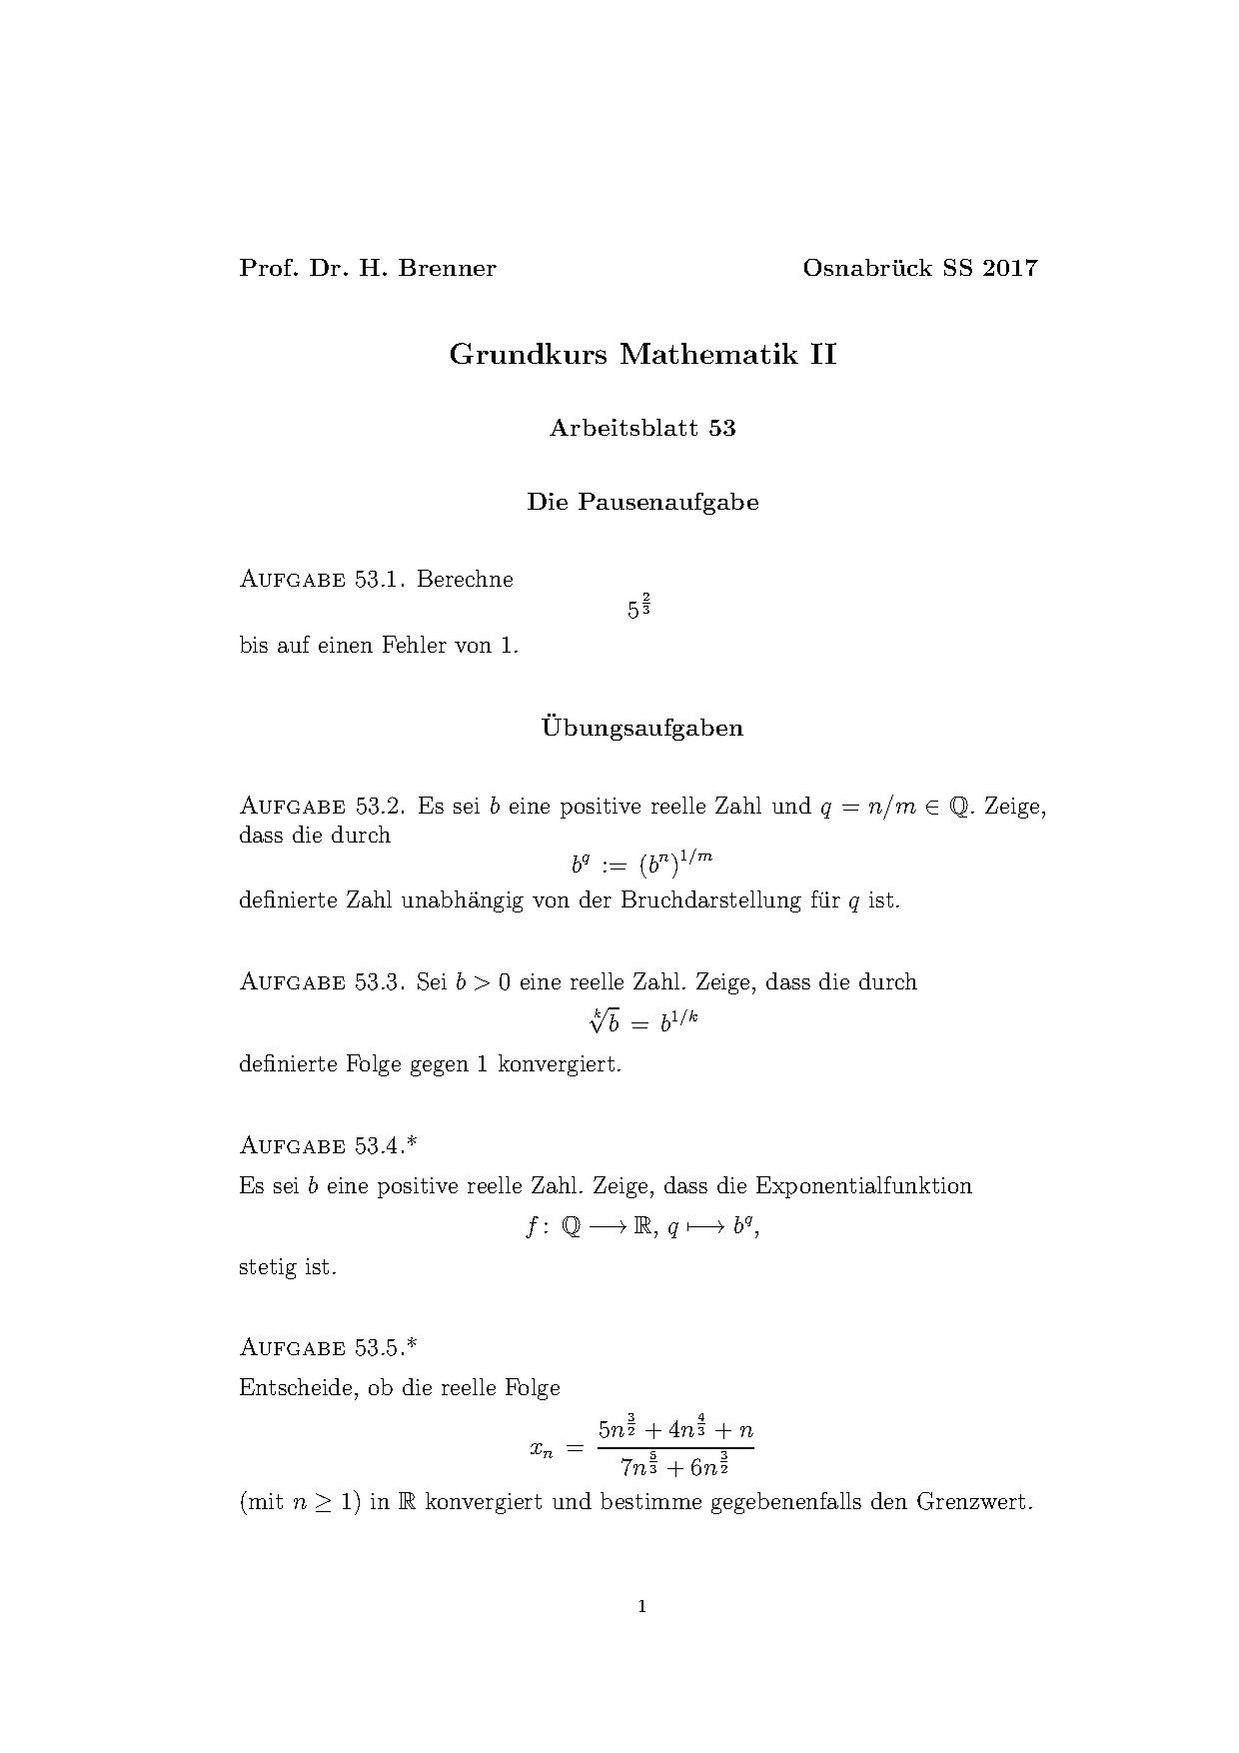 File:Grundkurs Mathematik (Osnabrück 2016-2017)Teil IIArbeitsblatt53 ...